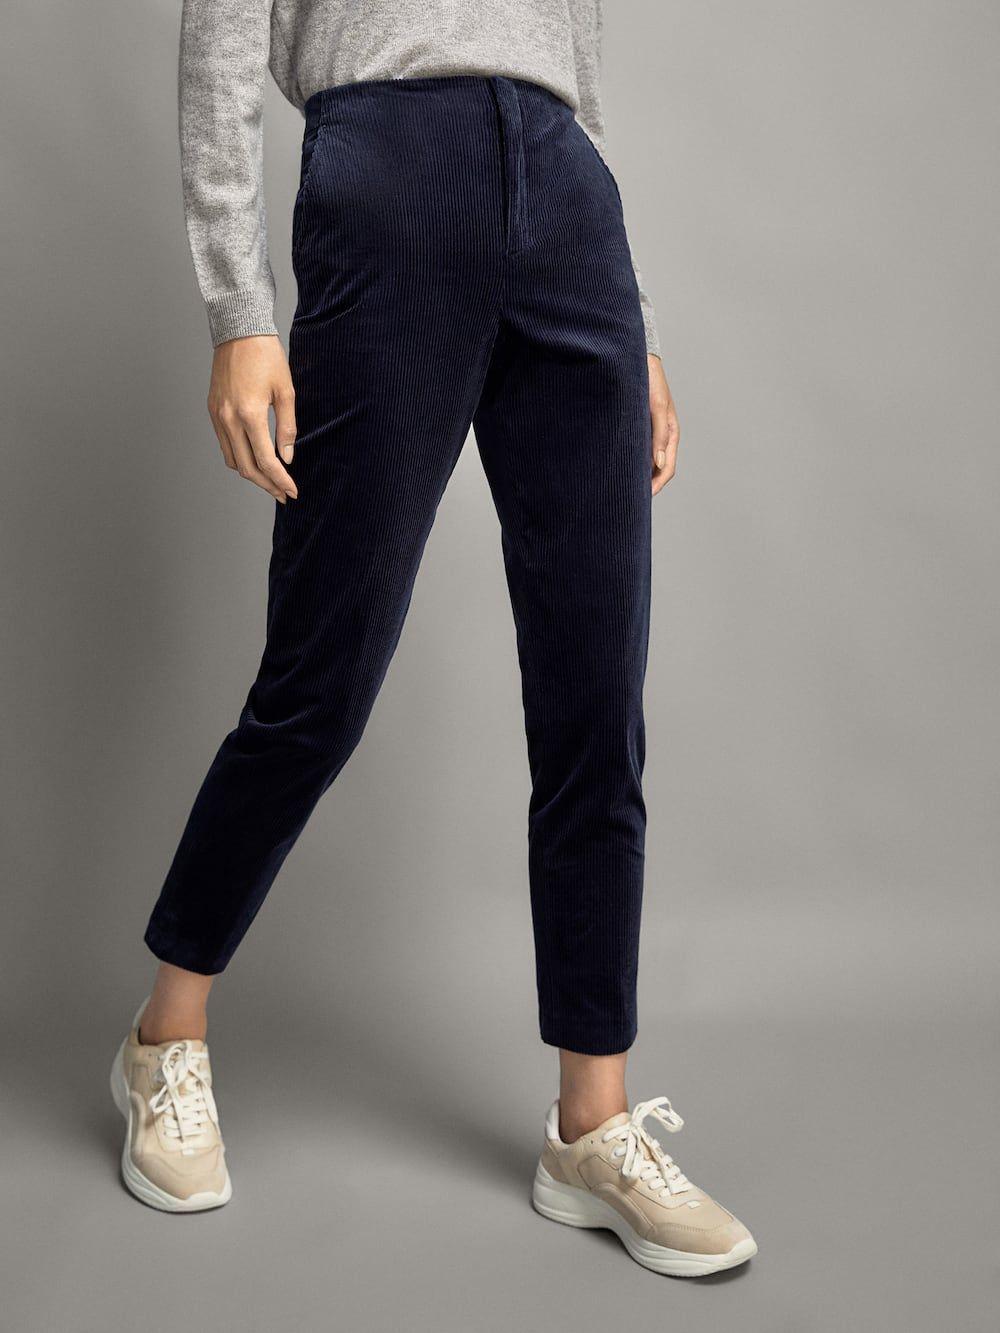 Pantalon Chino Pana Mujer Massimo Dutti Espana Pantalones De Pana Ropa Pantalones